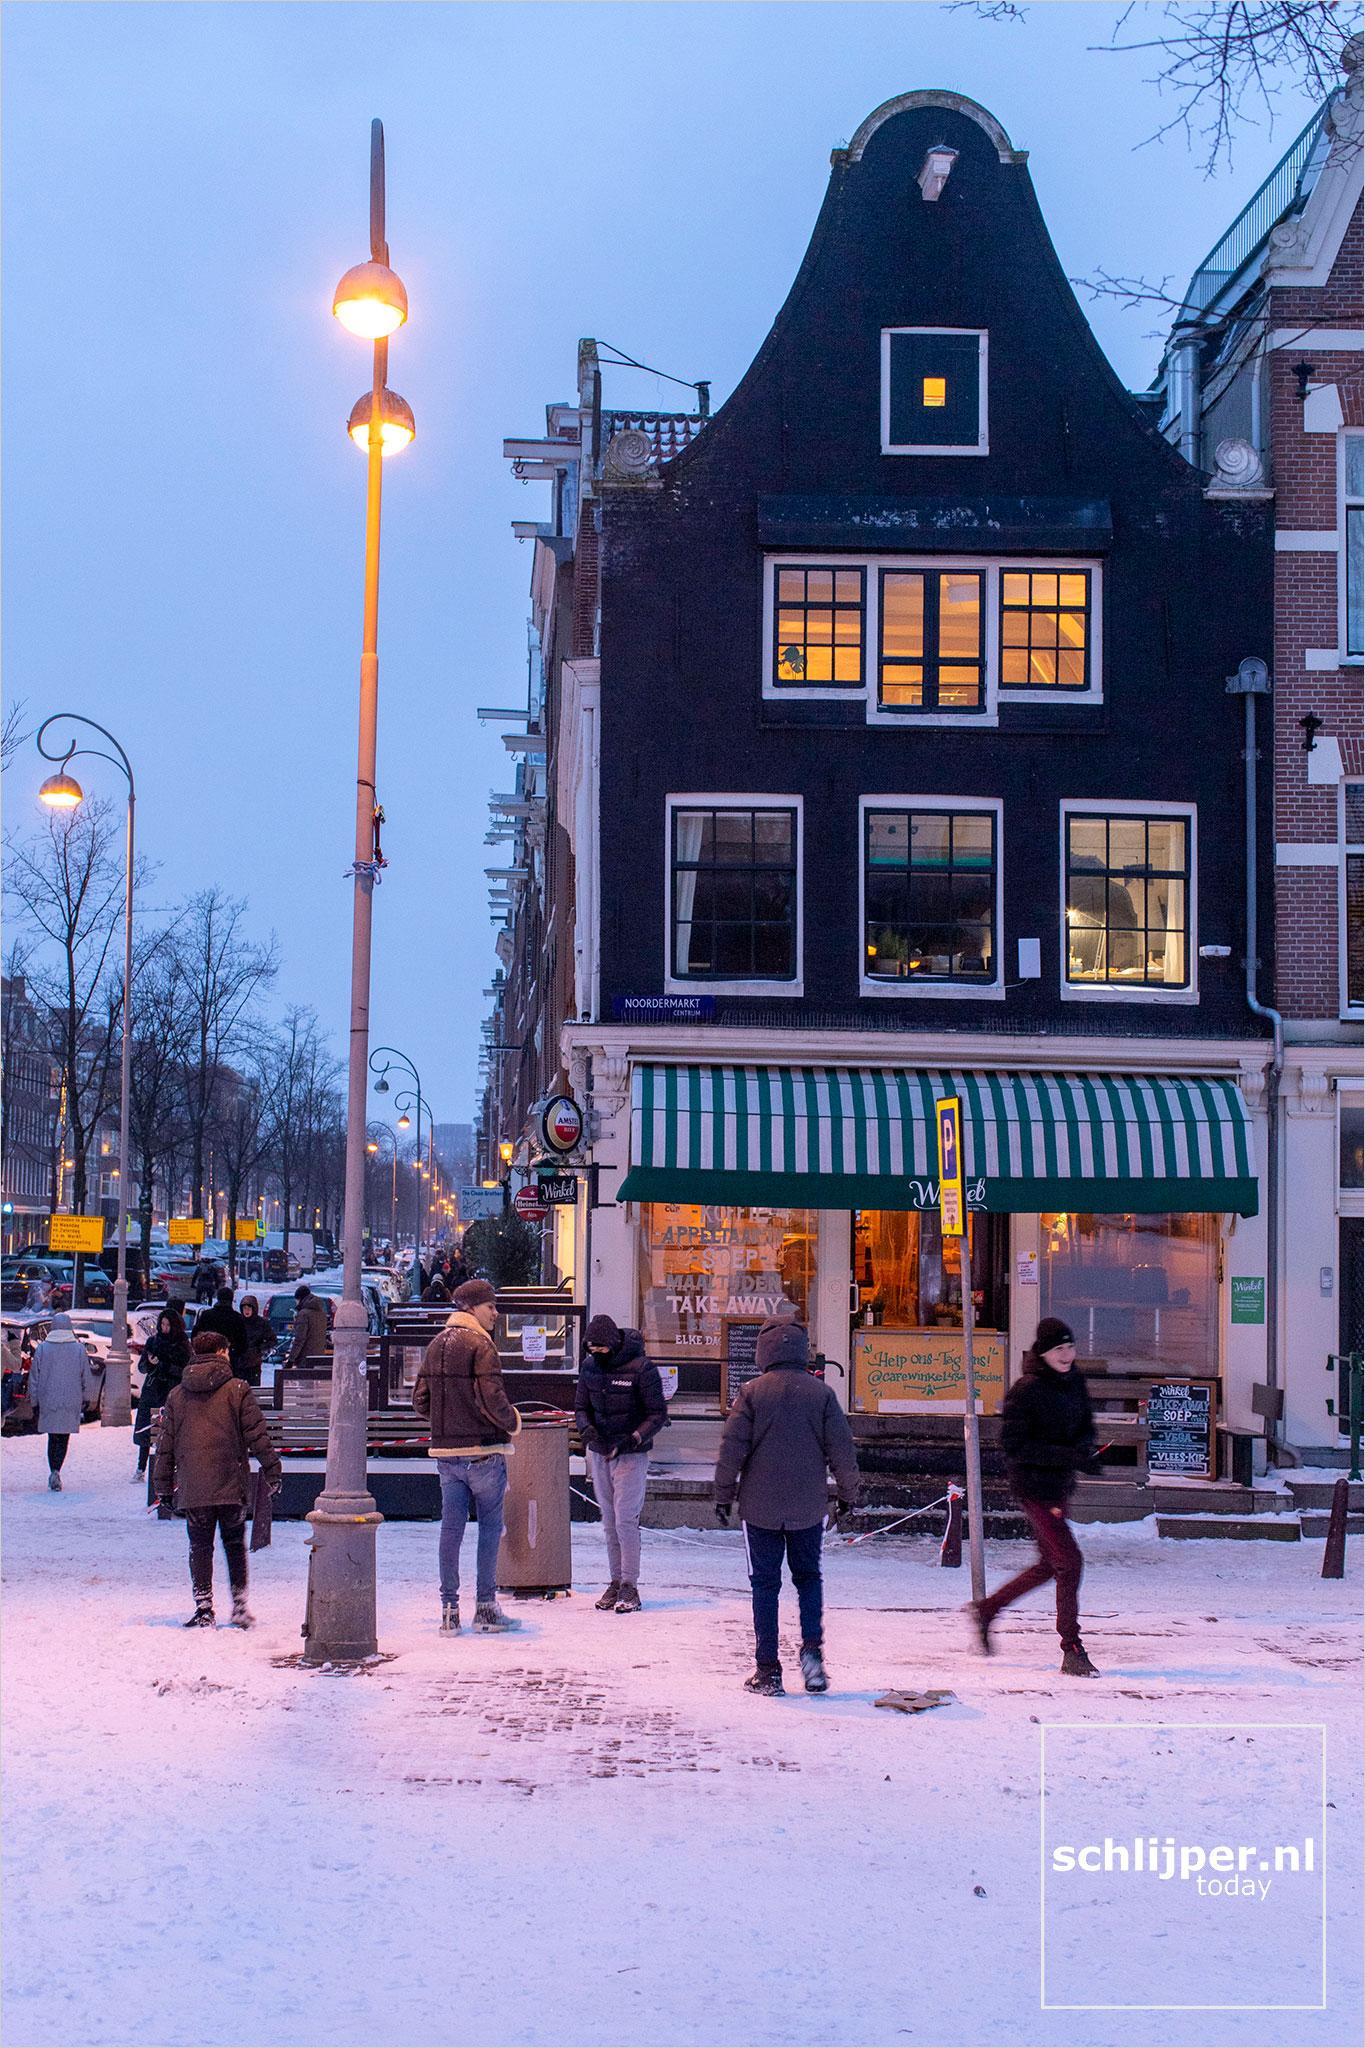 The Netherlands, Amsterdam, 8 februari 2021